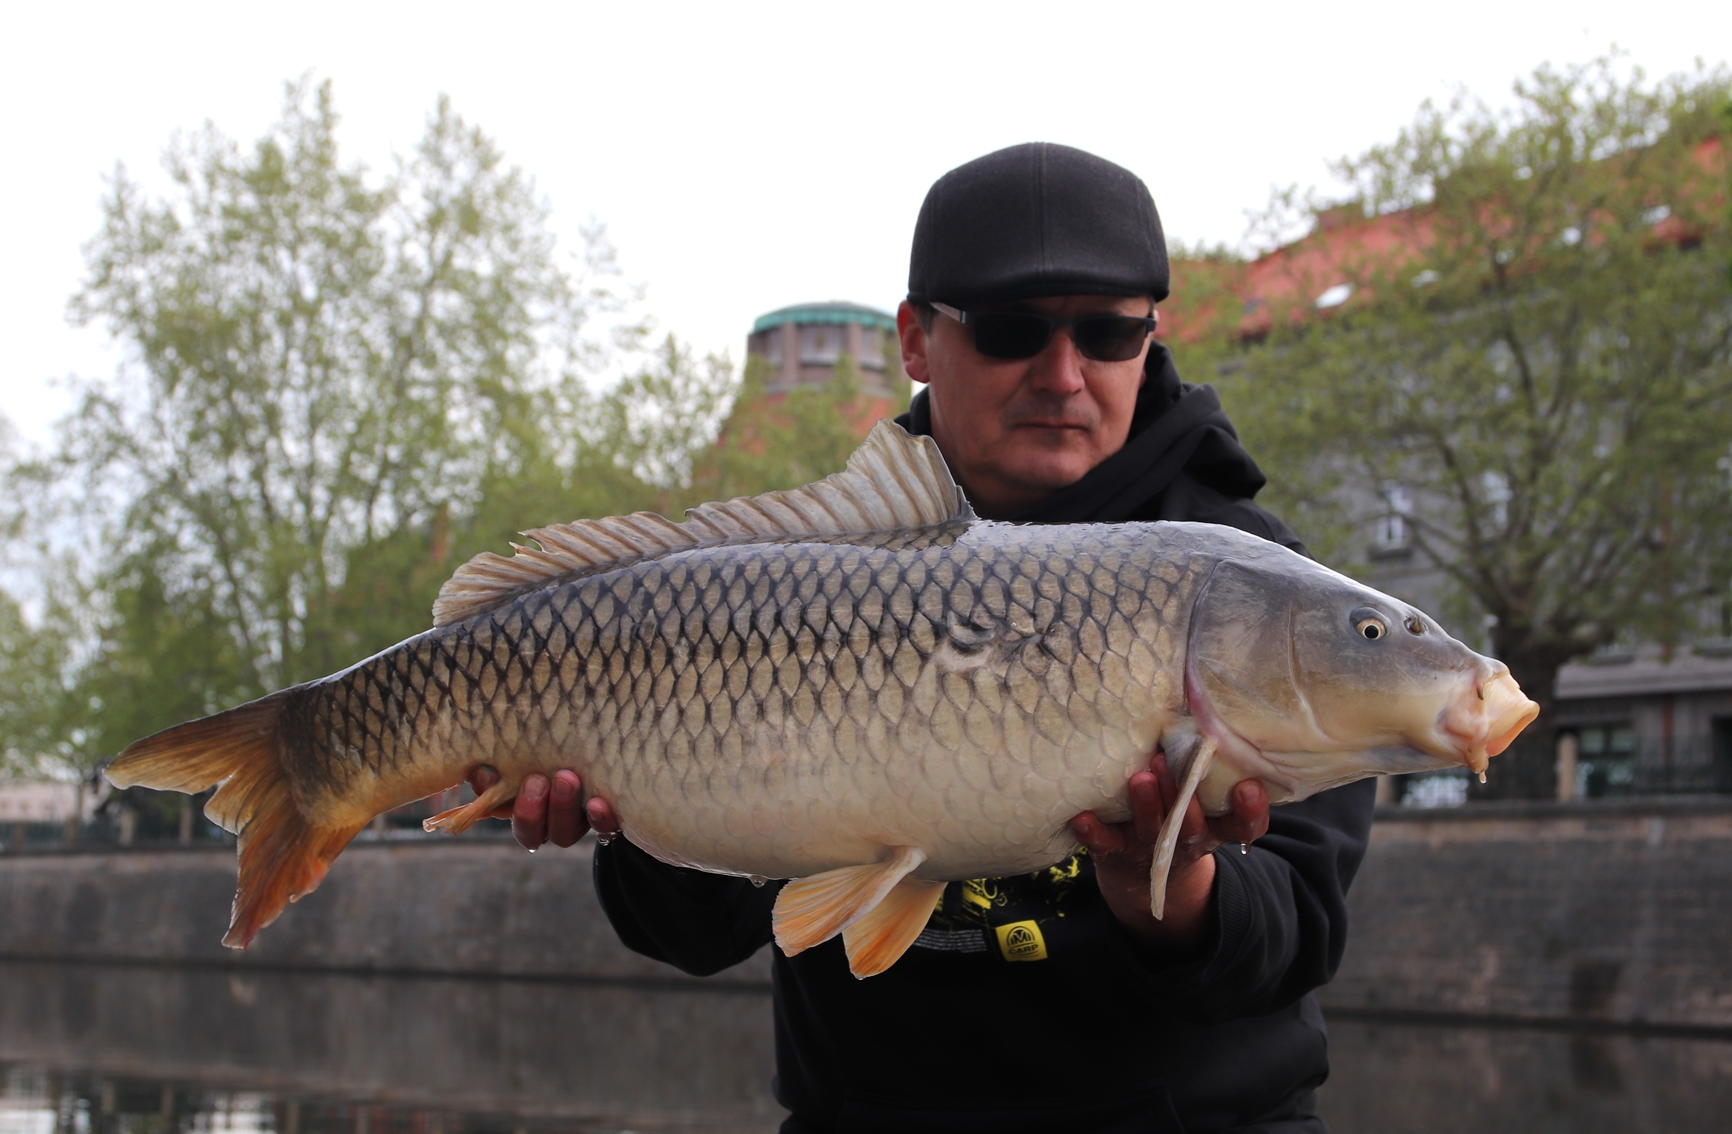 Boilies Mivardi Rapid Easy Catch Česnek & Chilli 950 gr 24 mm